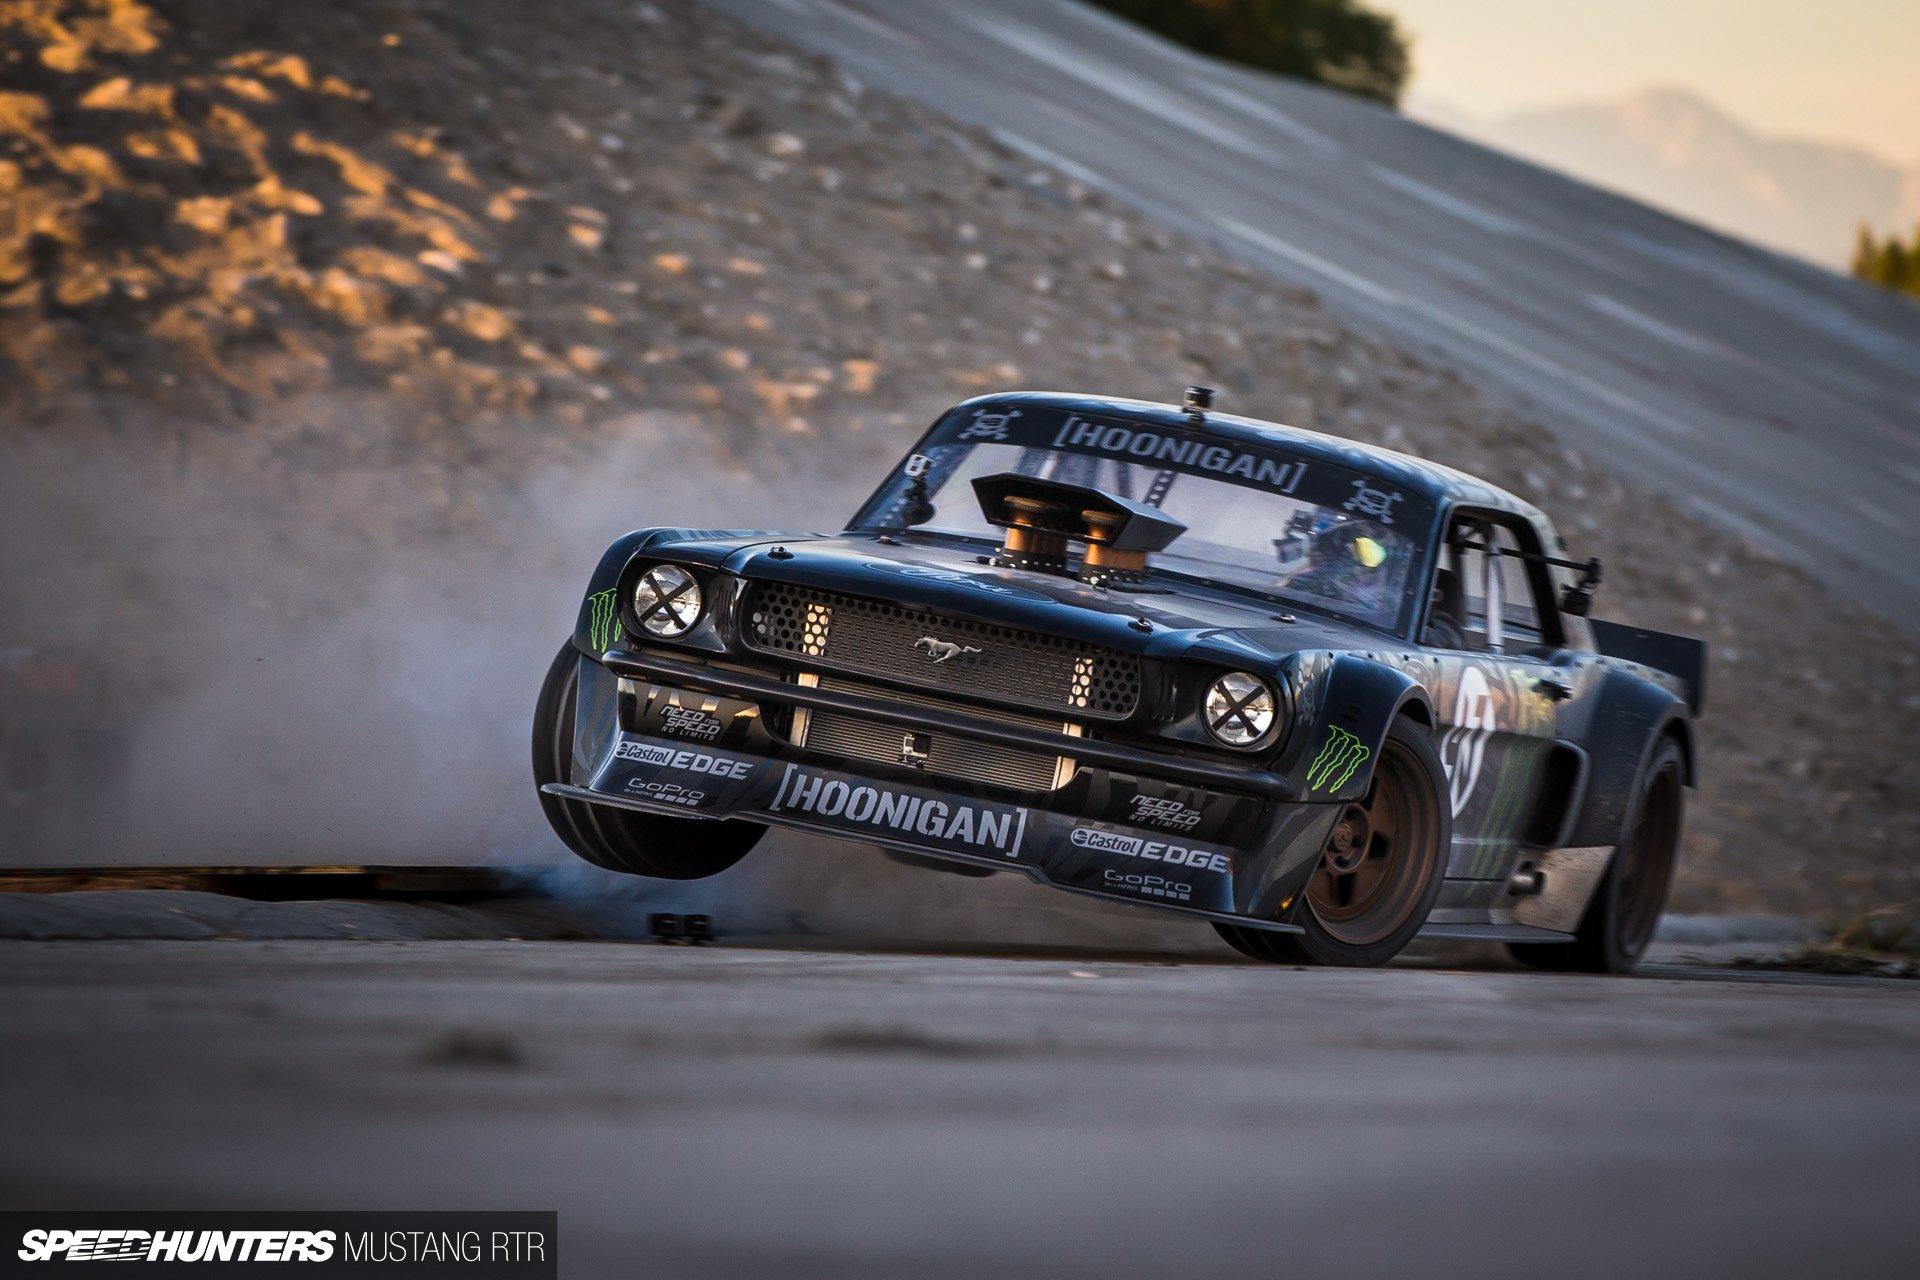 Gymkhana 7 Car Wallpaper Hoonicorn Rtr Ford Mustang Drift Race Racing Hot Rod Rods